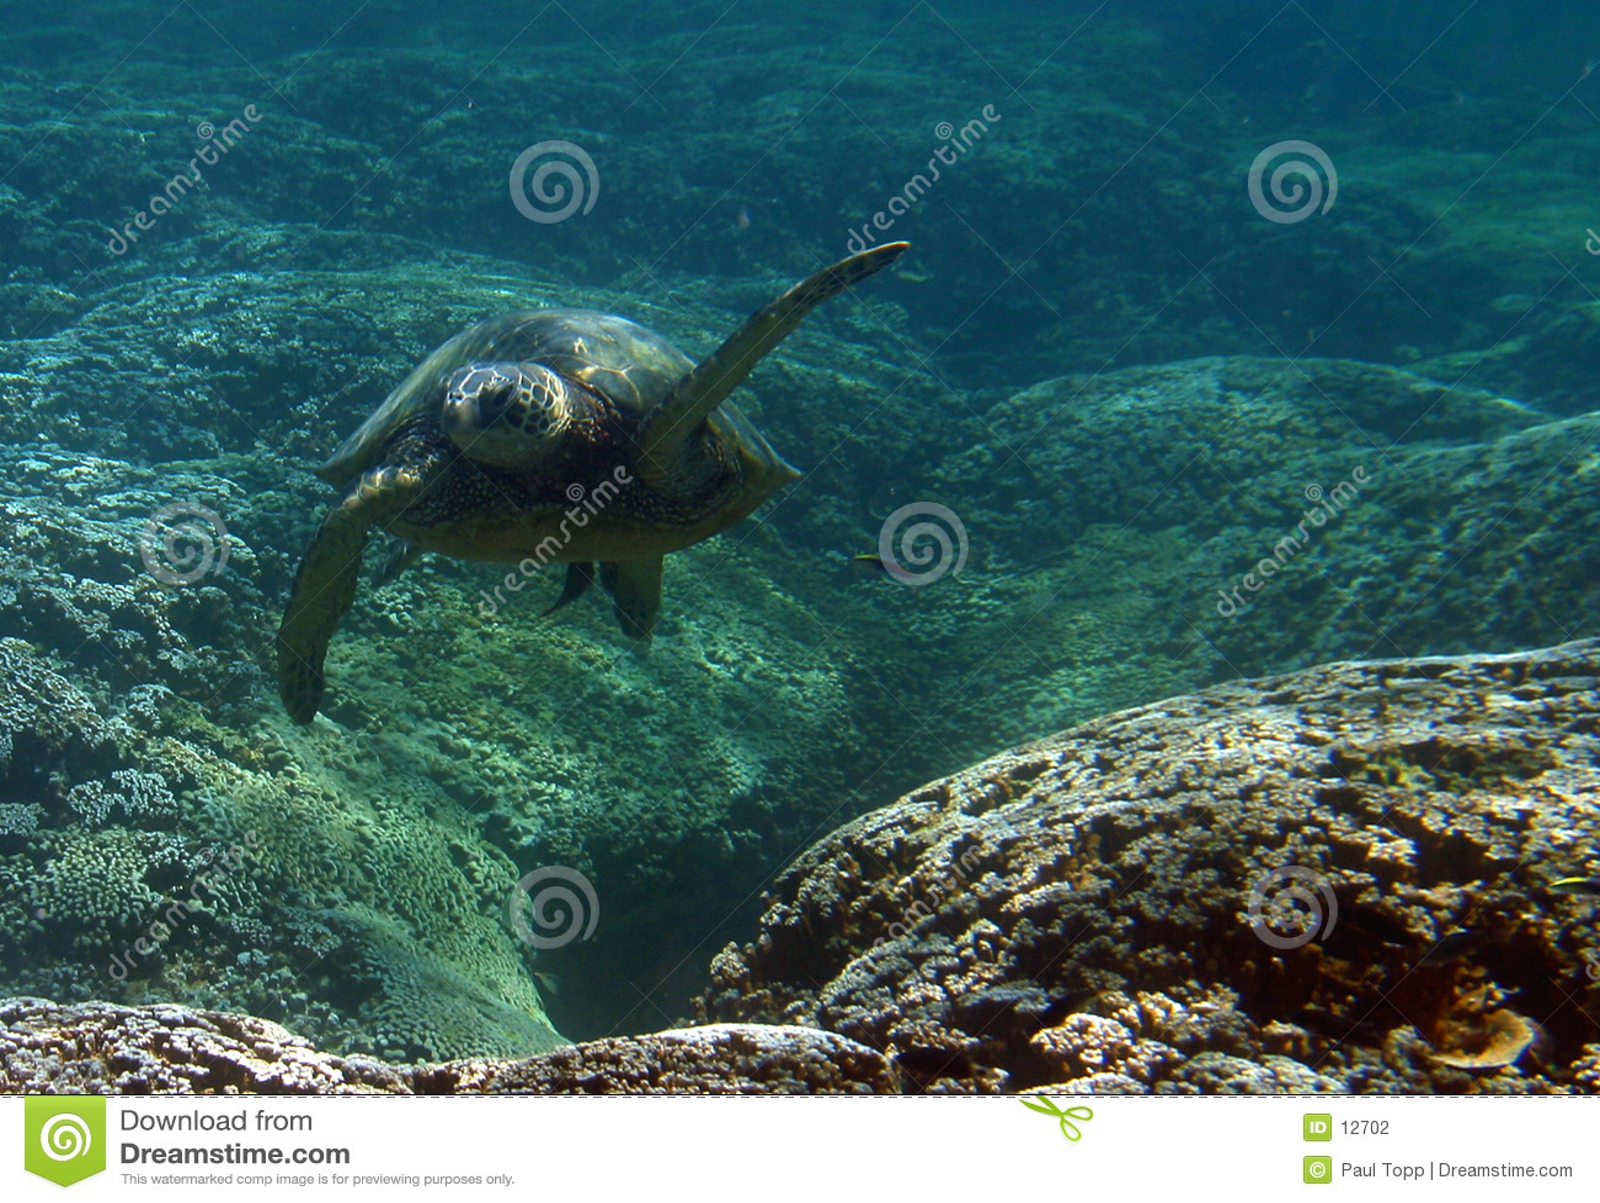 Underwater Green Sea Turtle